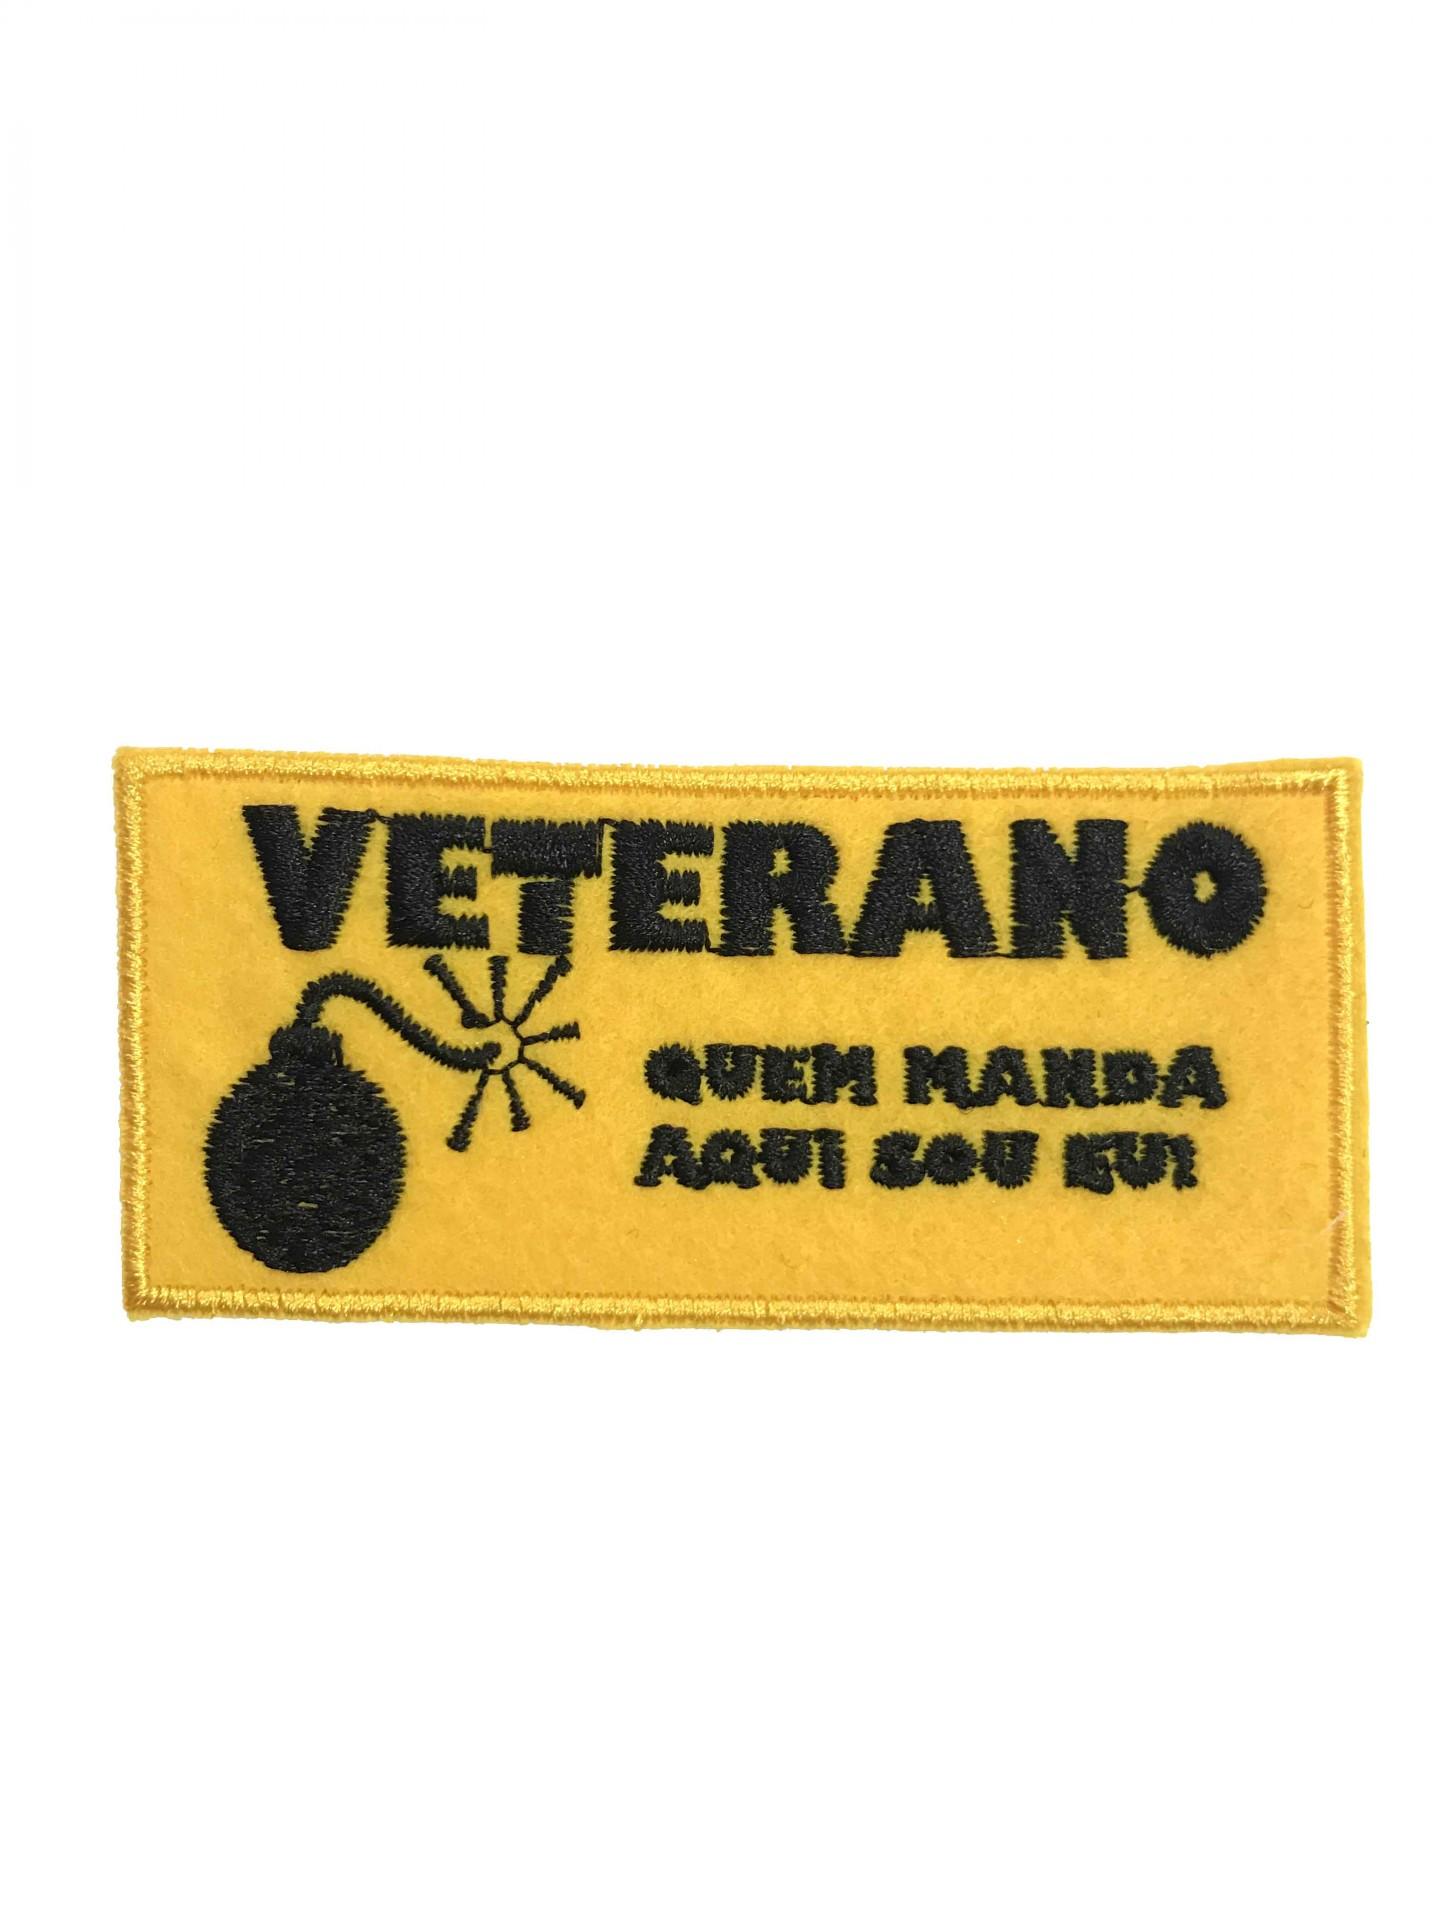 Emblema Veterano - quem manda aqui sou eu